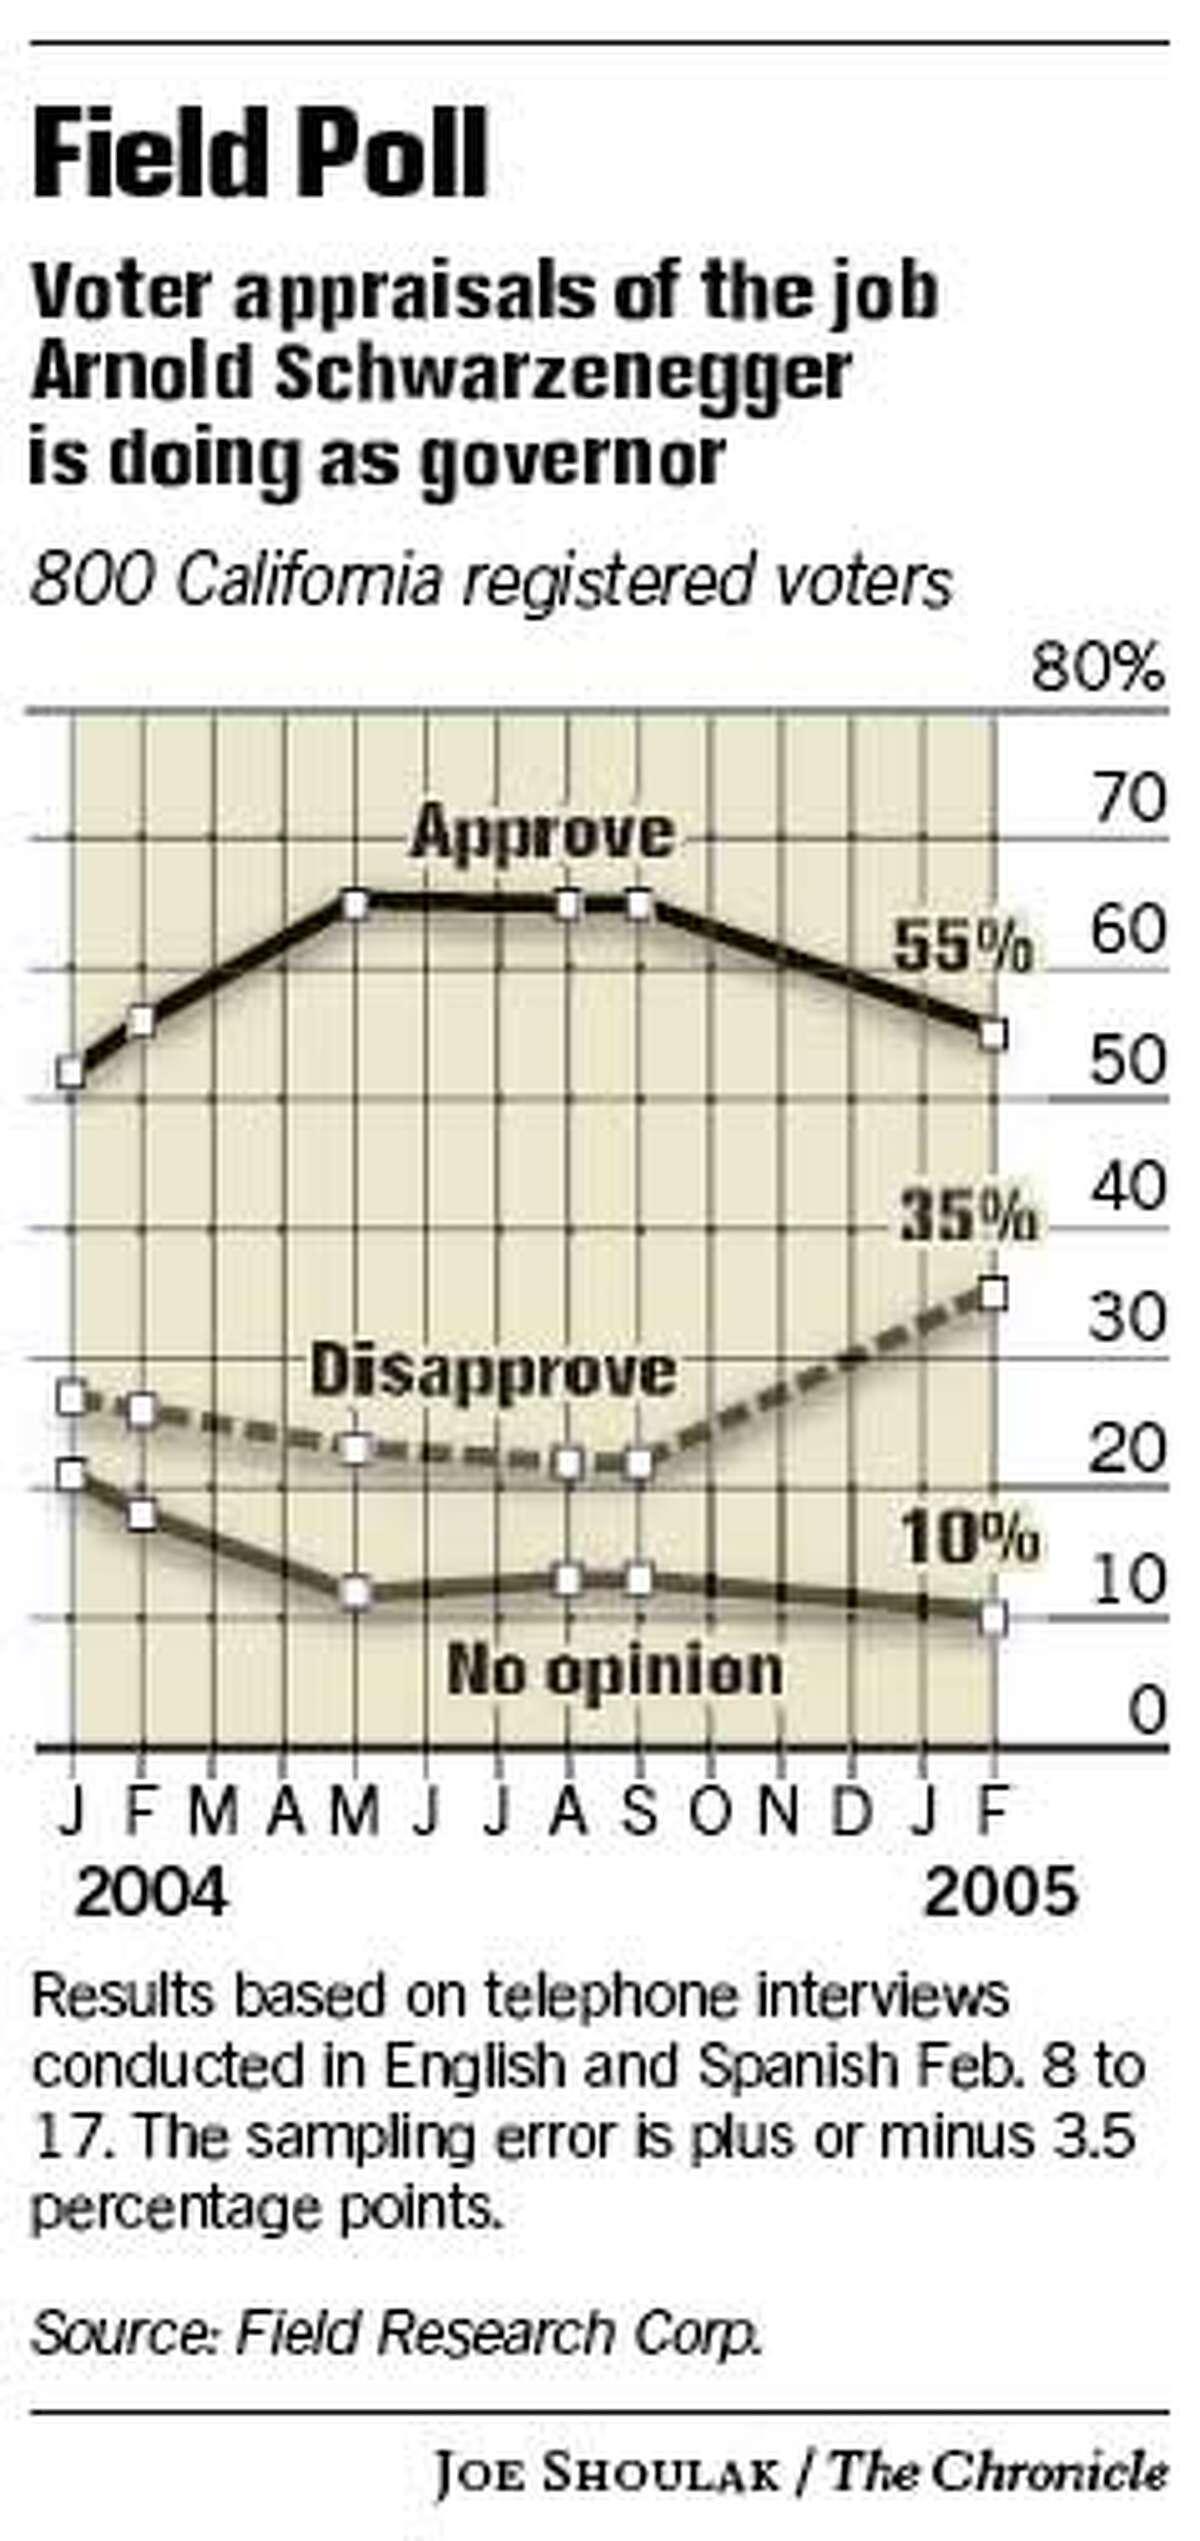 Field Poll. Chronicle graphic by Joe Shoulak